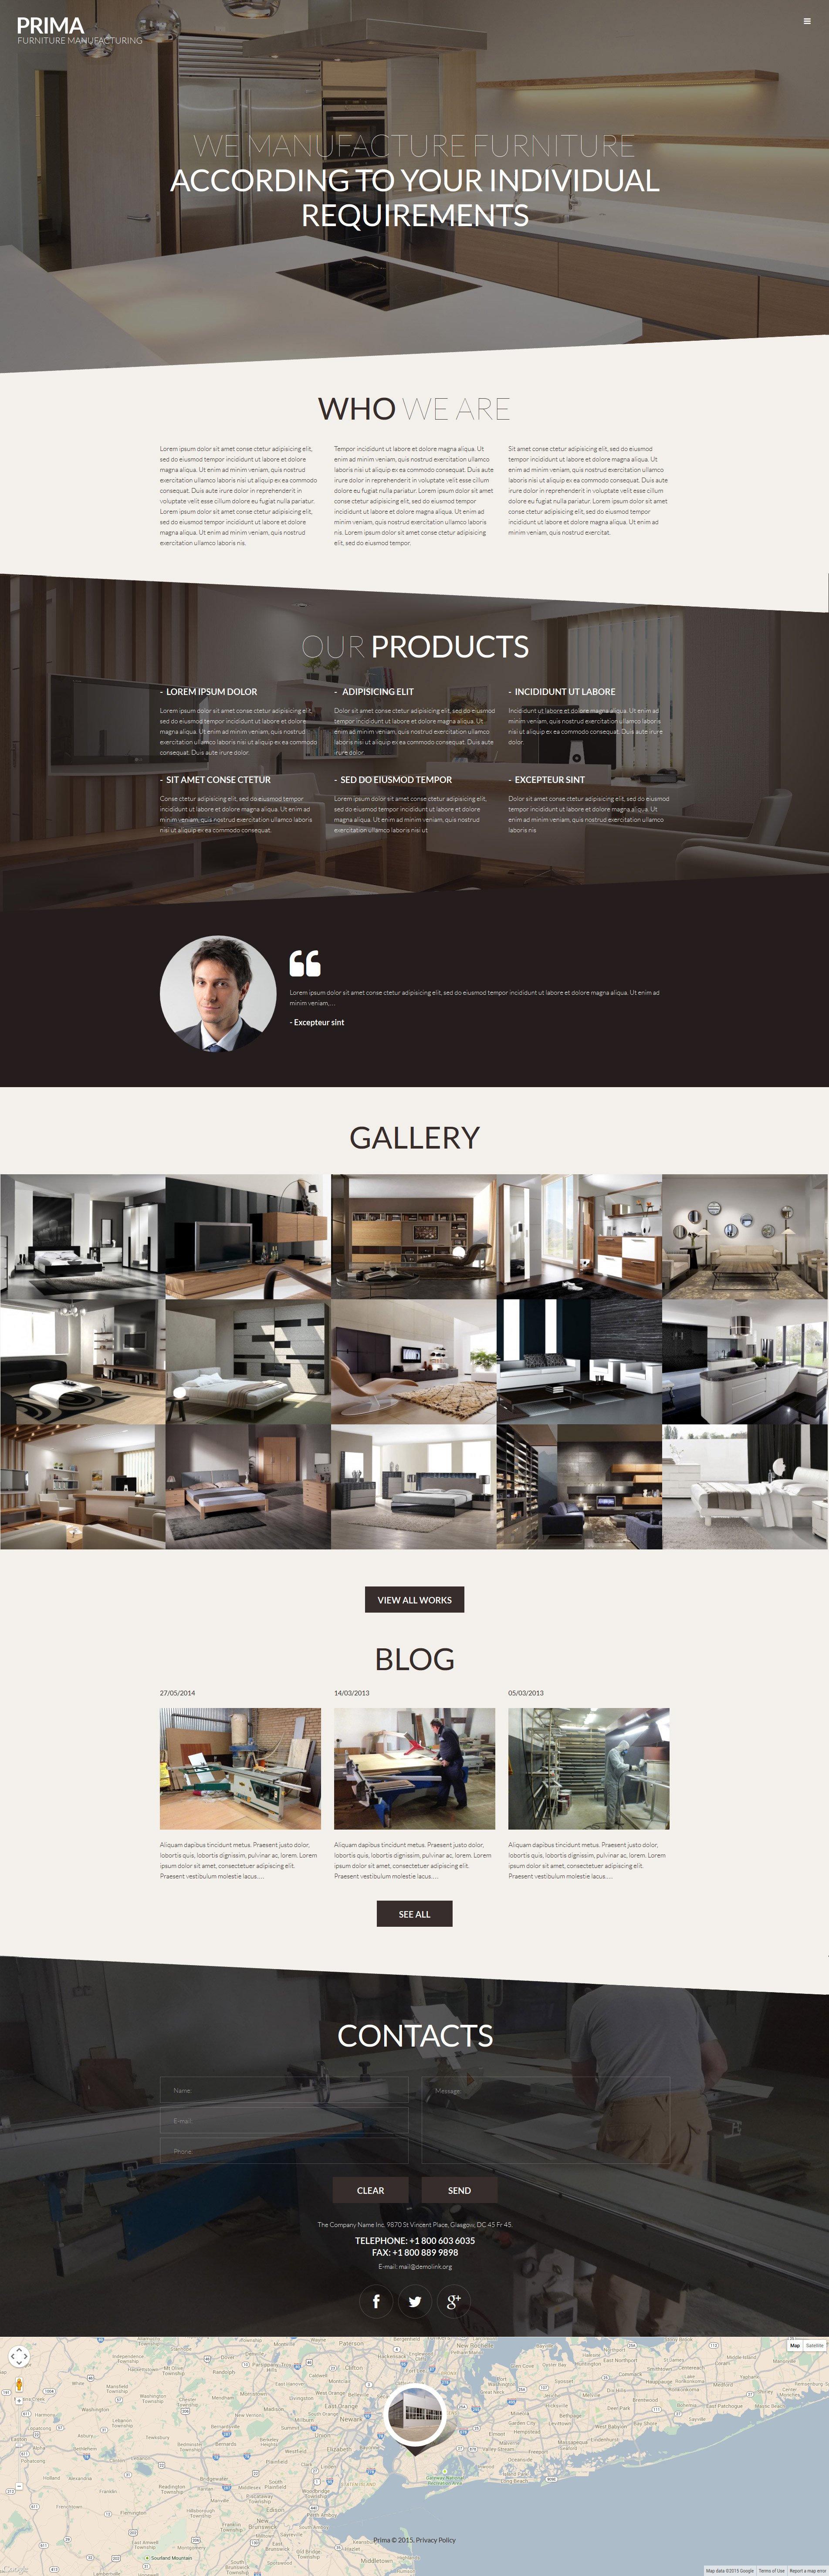 Адаптивный шаблон сайта на тему дизайн и интерьер #53145